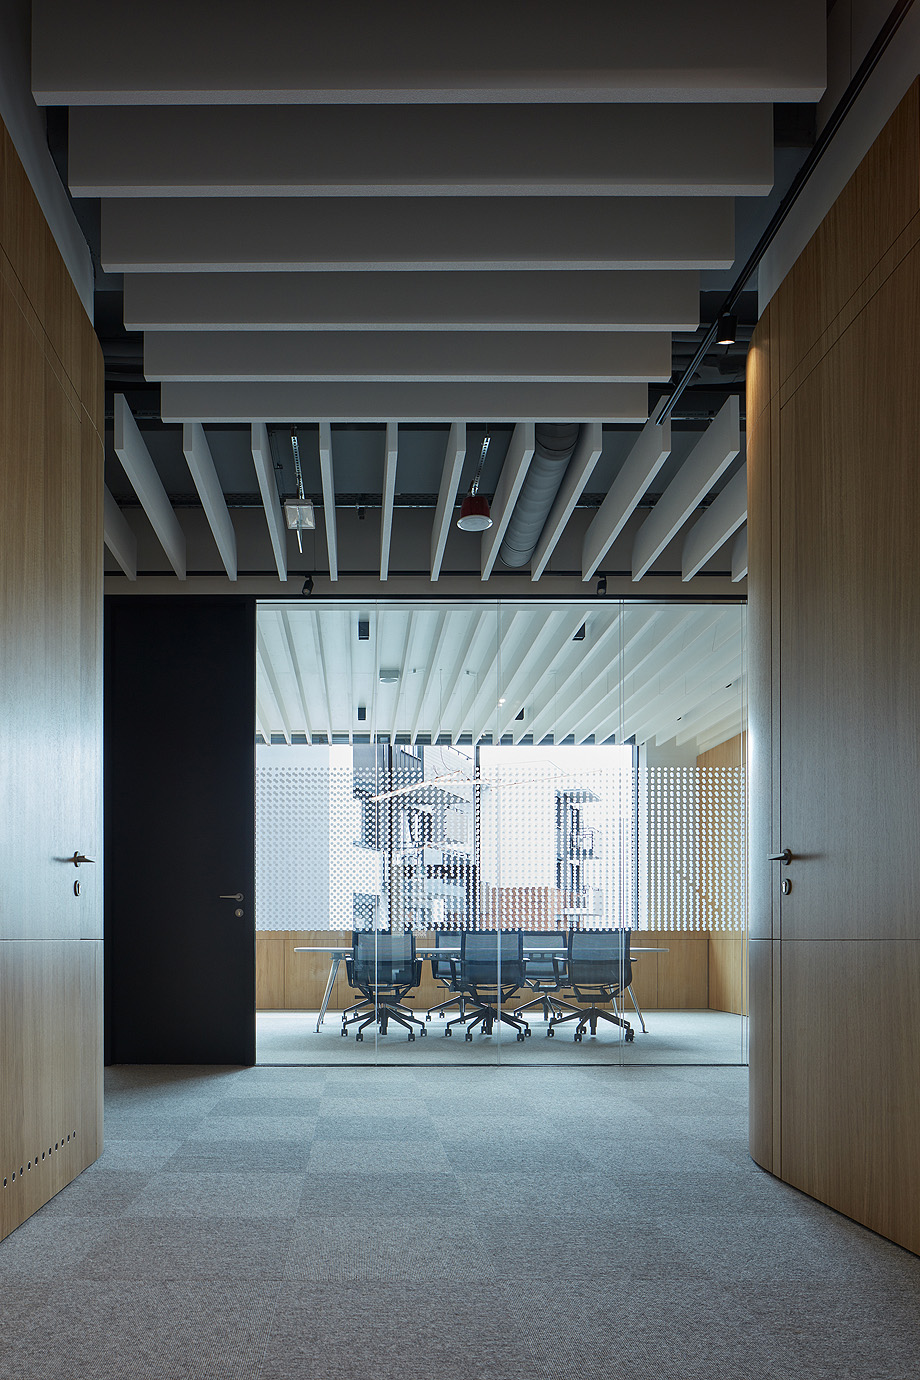 oficinas lucron de cechvala architects - foto boysplaynice (4)